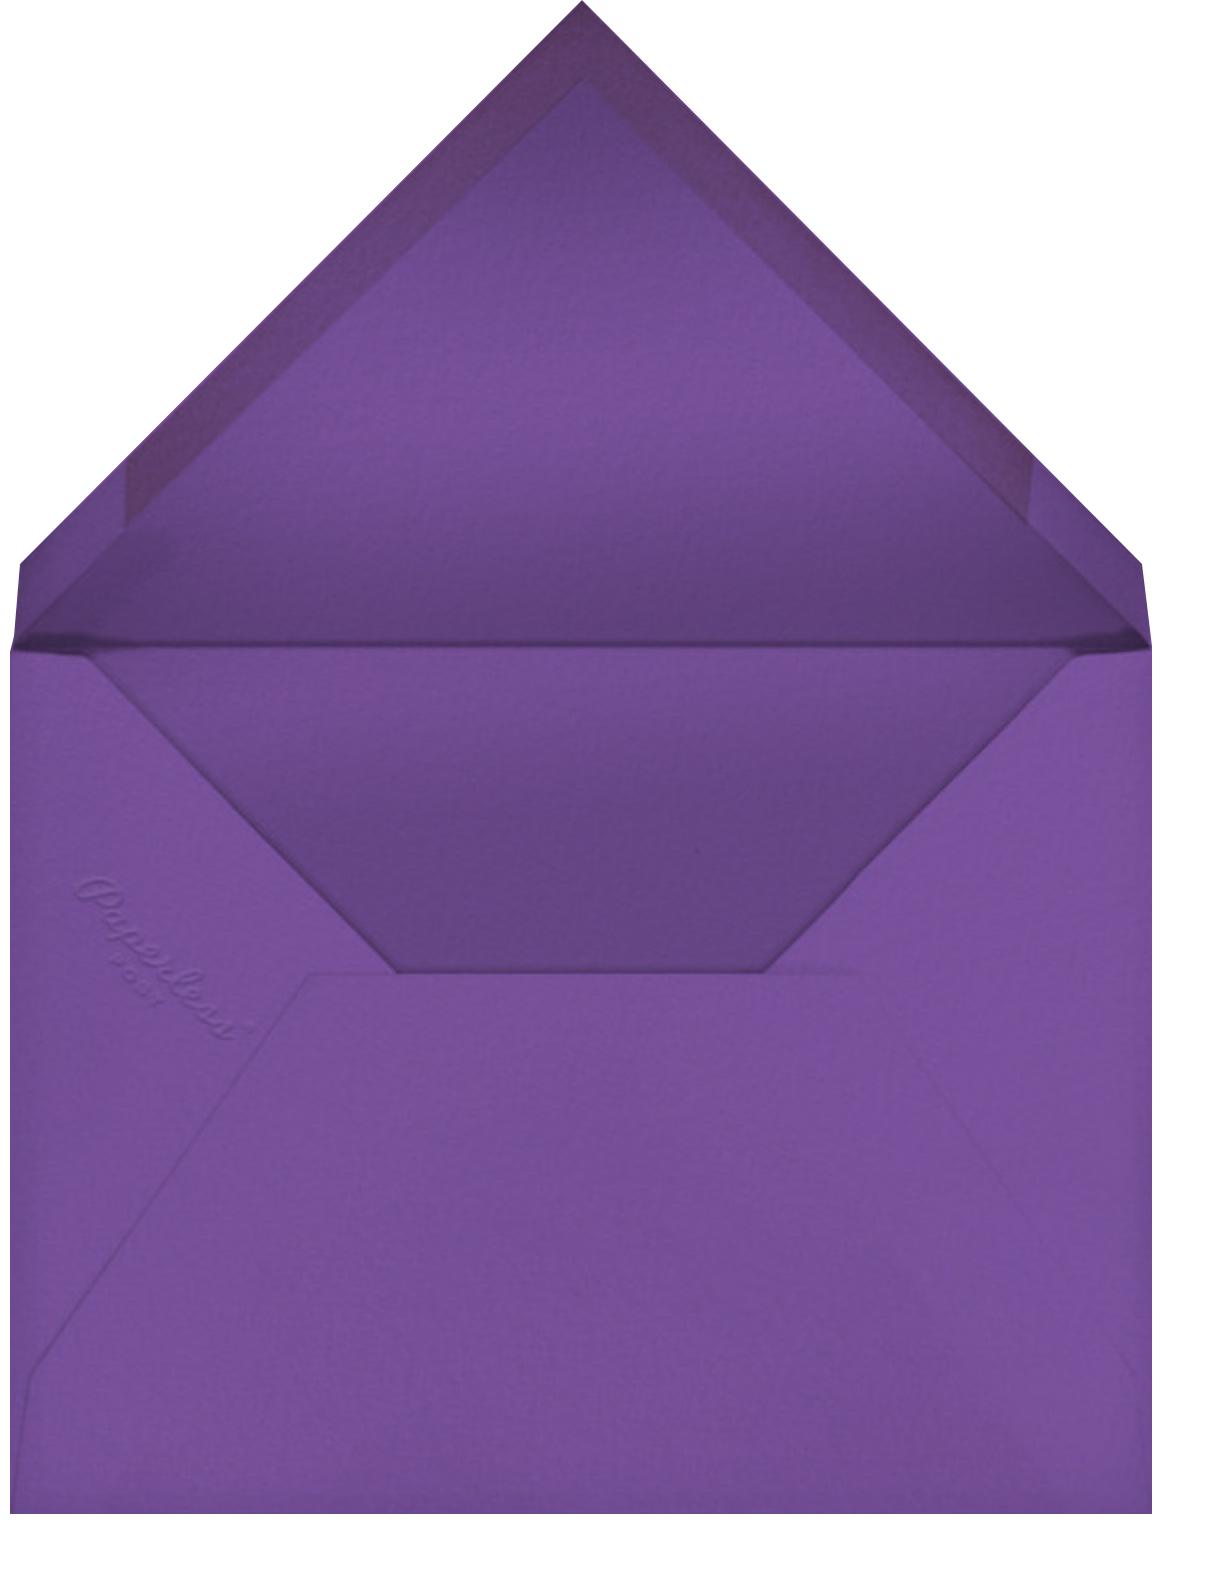 Rive Gauche - Purple - Paperless Post - General entertaining - envelope back